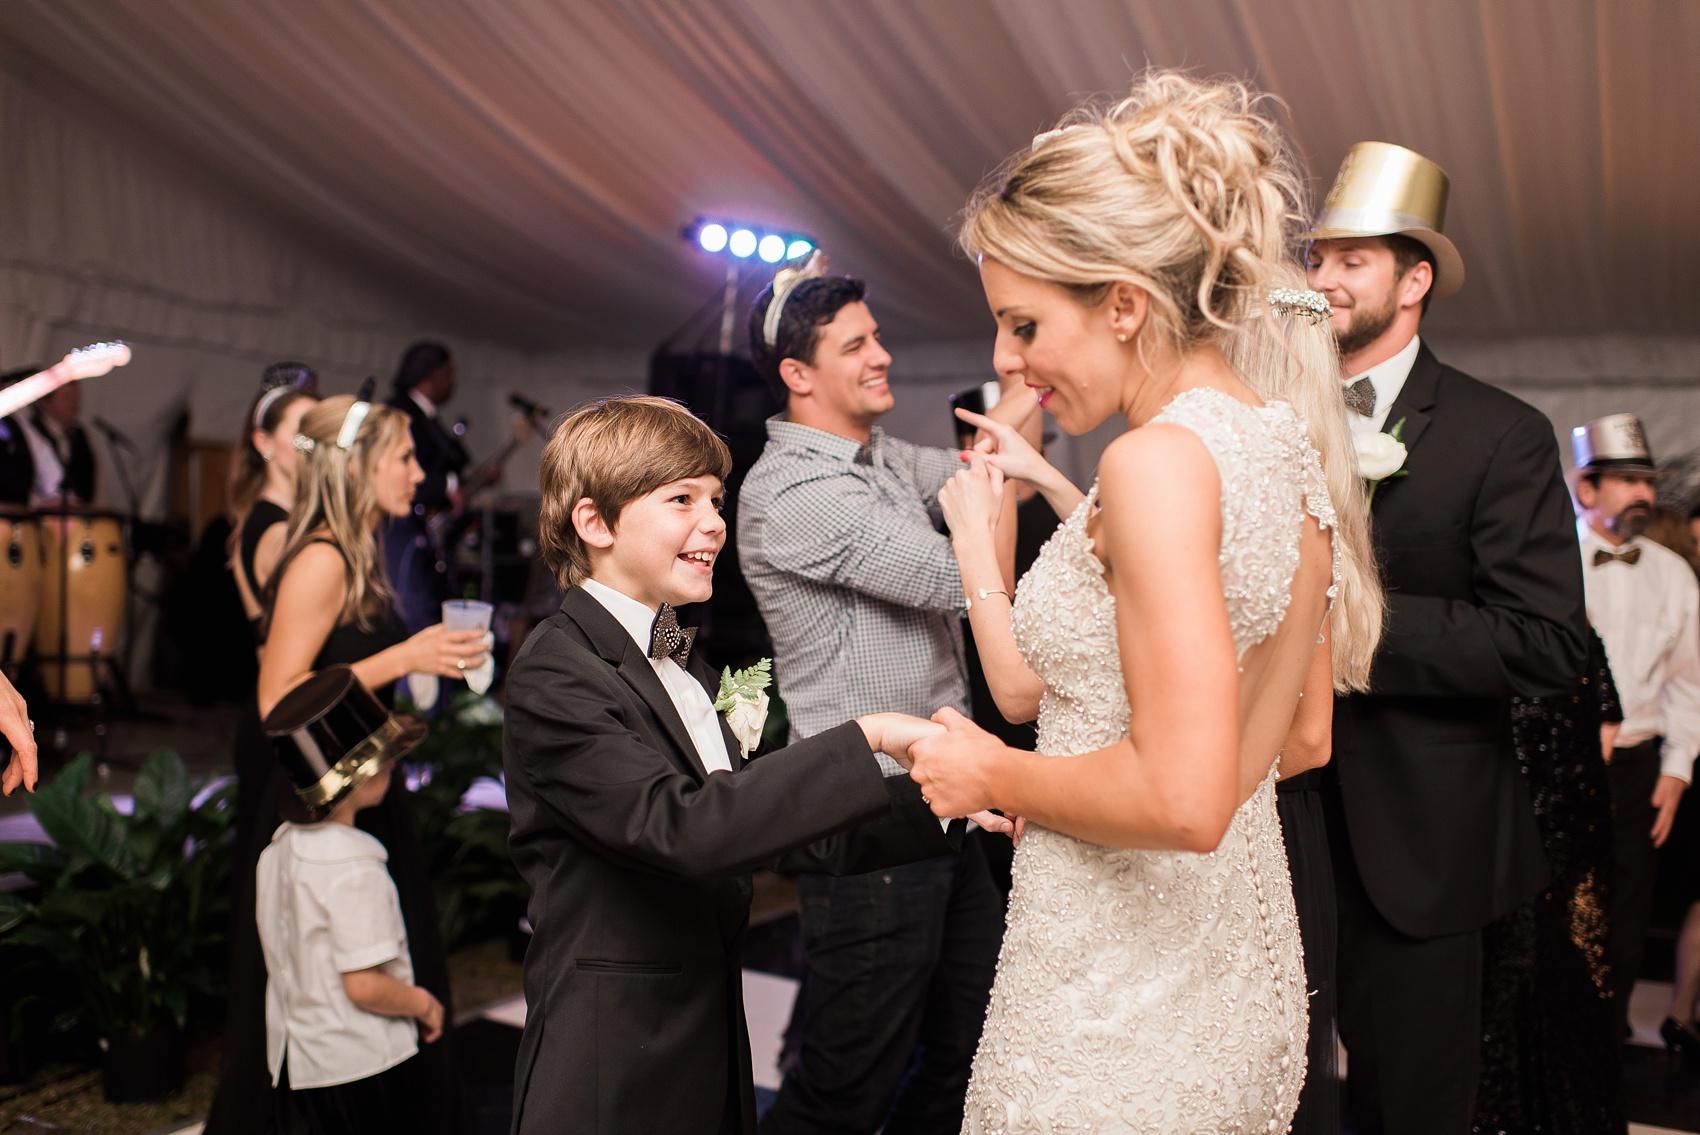 South_carolina_wedding_photographer_0128.jpg